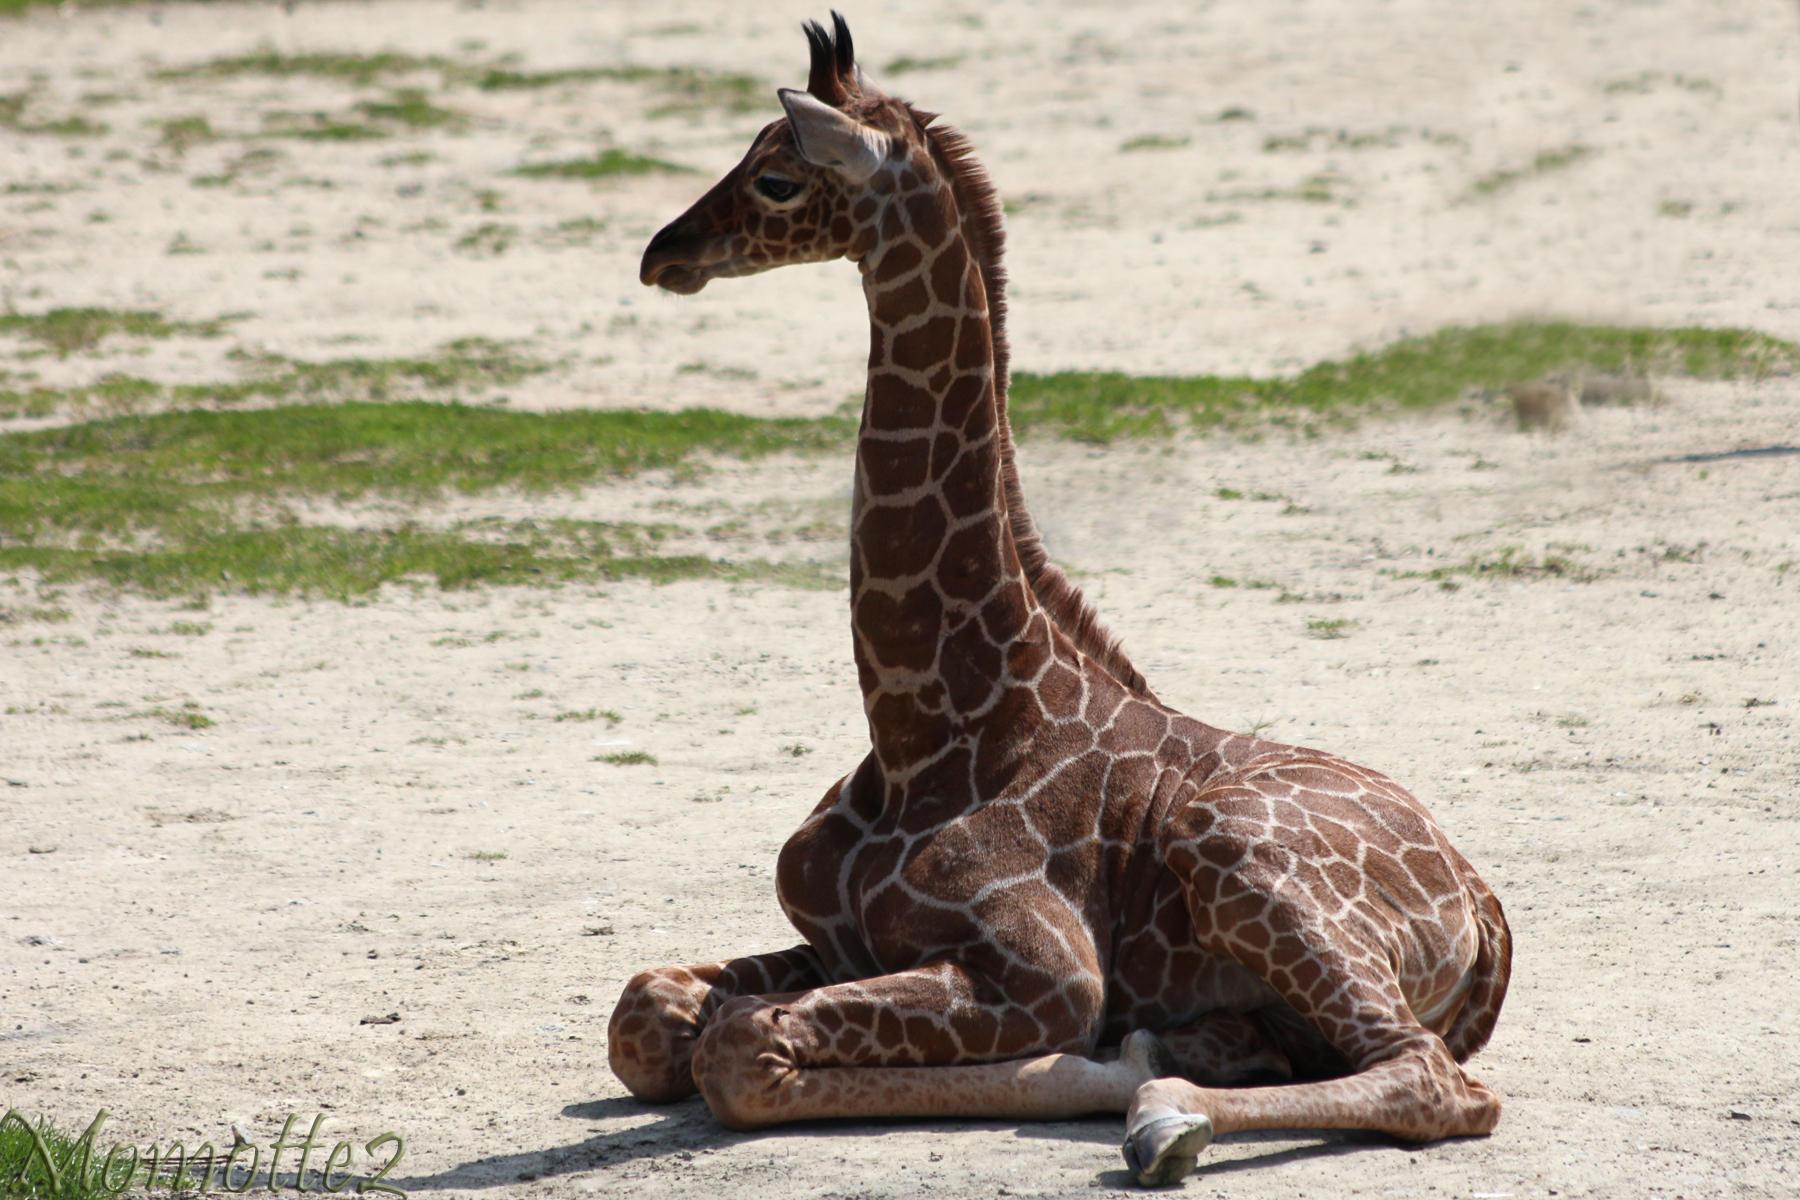 Relaxing baby giraffe by Momotte2